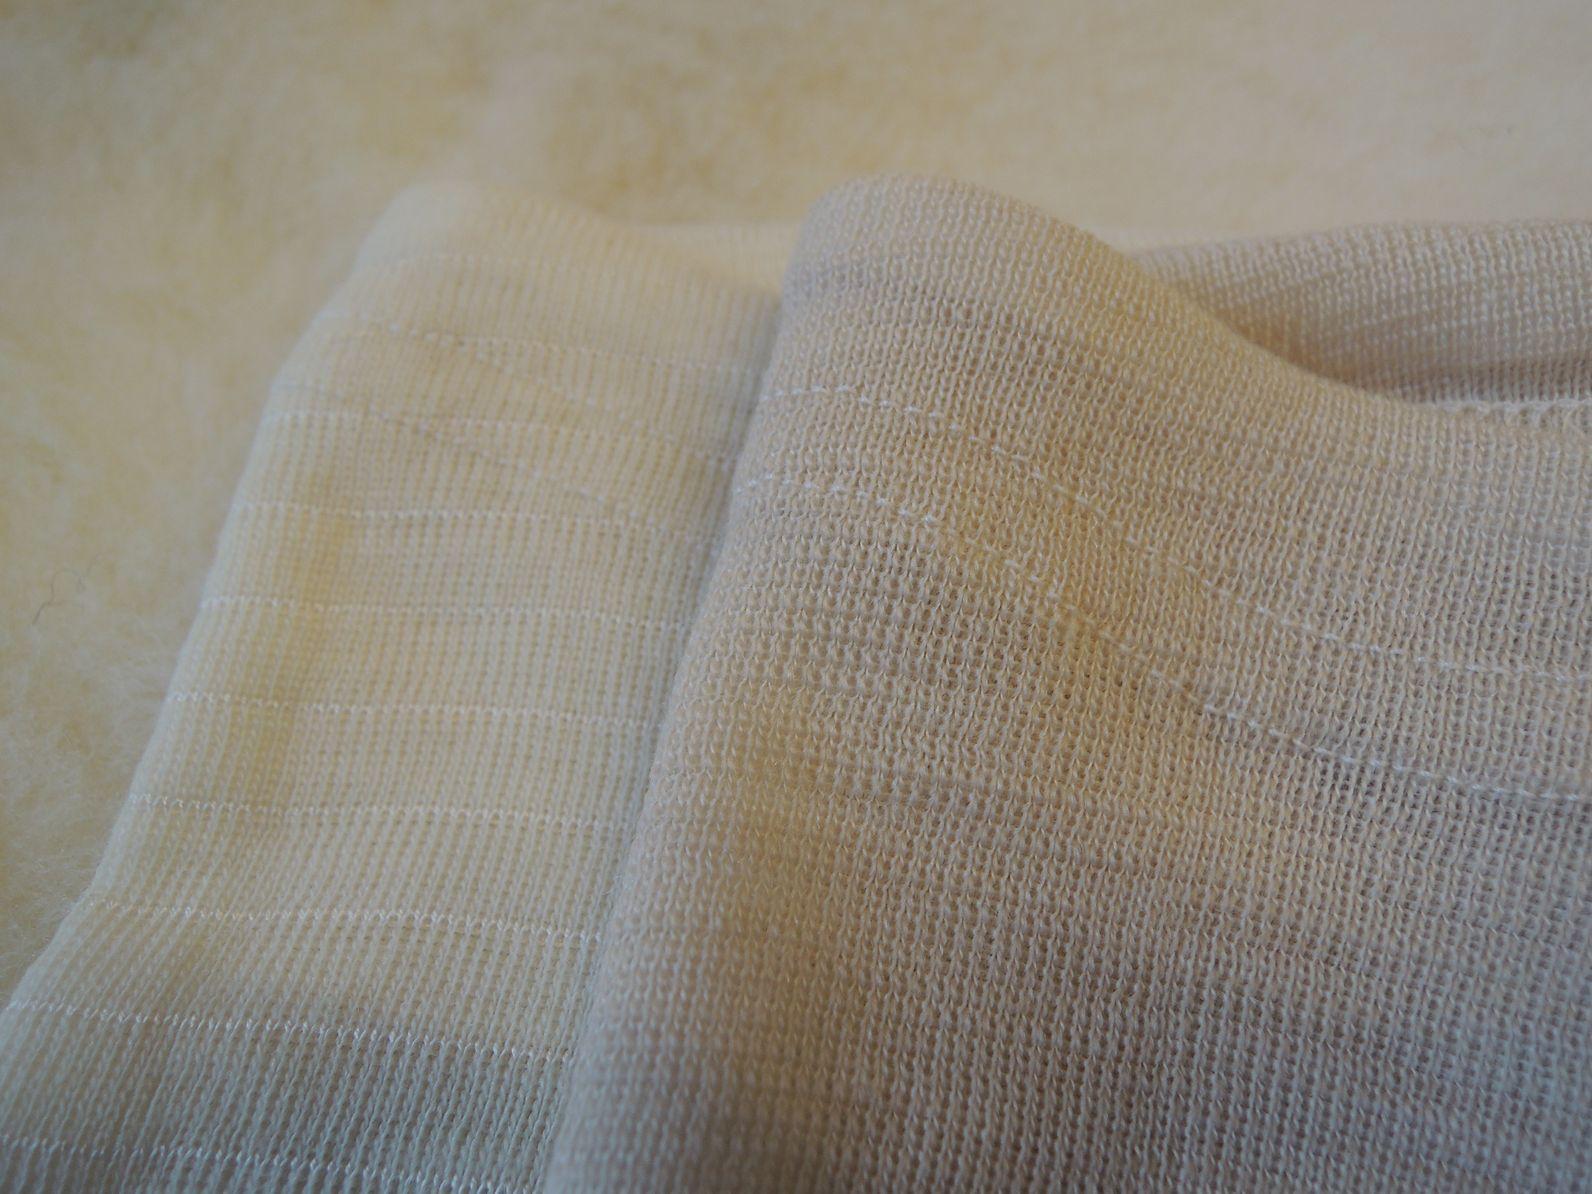 bester Platz erster Blick Schönheit Strumpfhose, Wolle-Seide